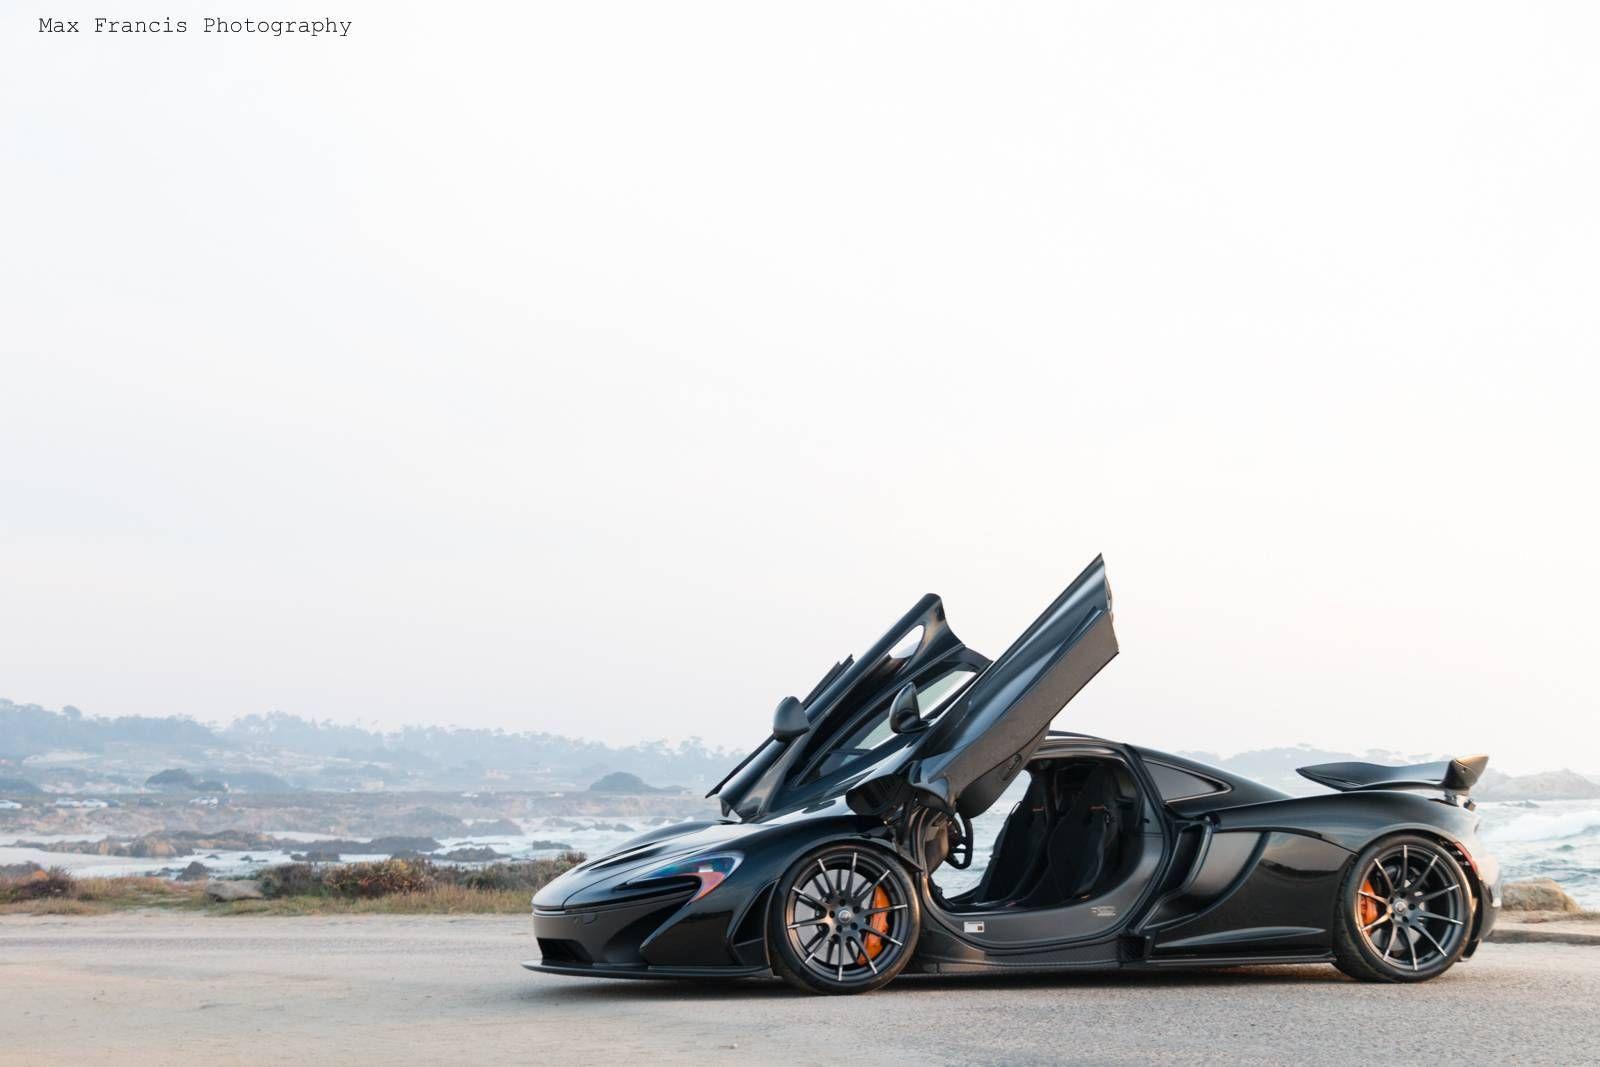 100 Best Supercar Photos of 2015 - GTspirit